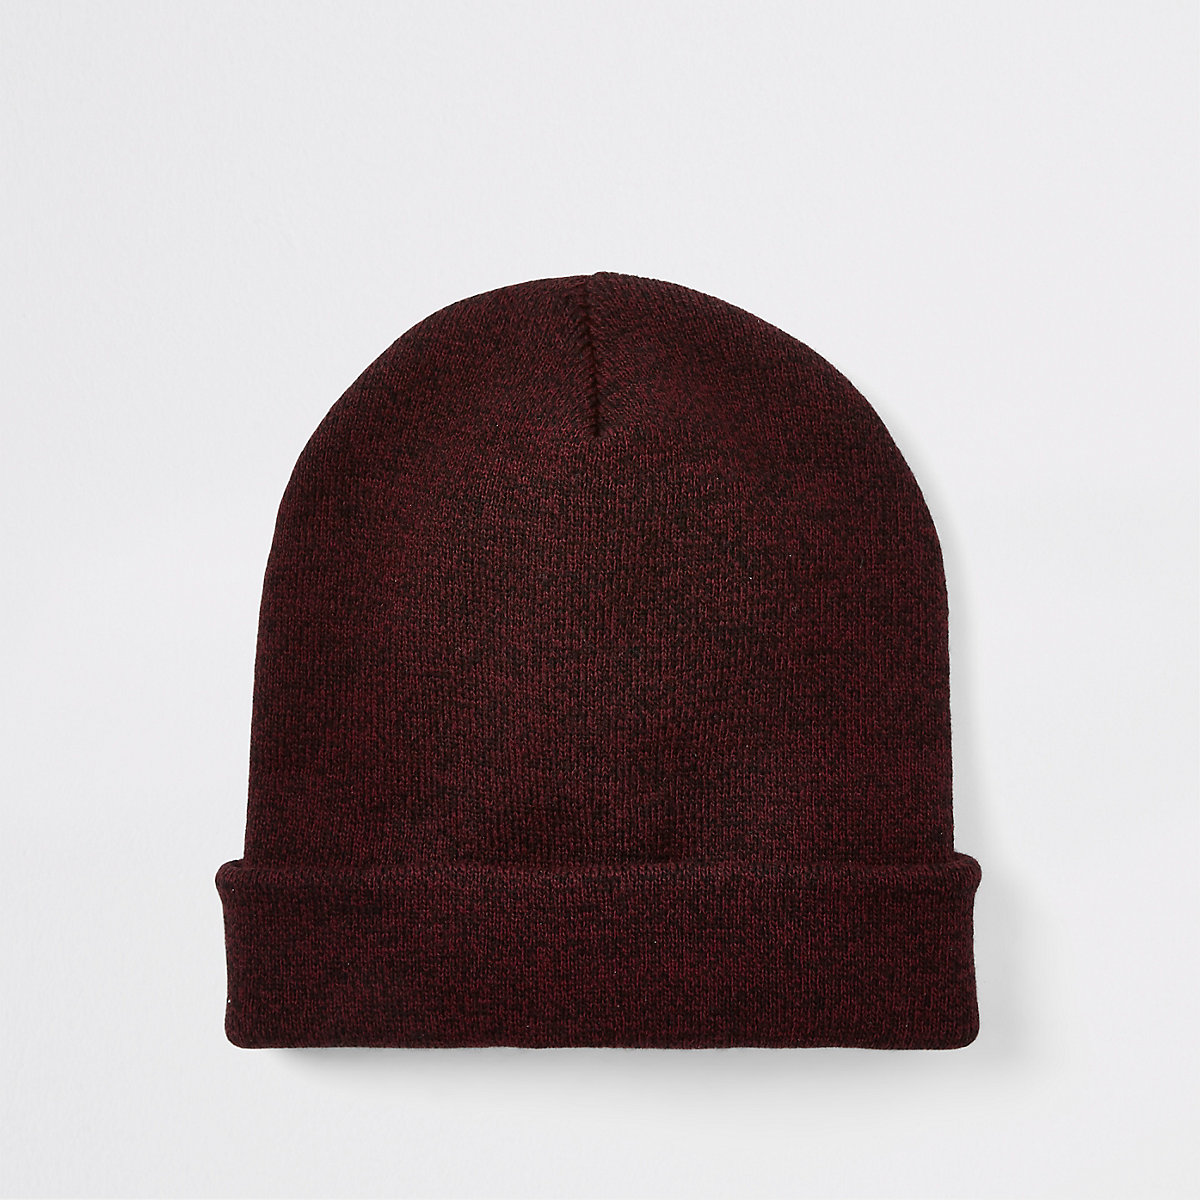 Red twist knit slouch beanie hat